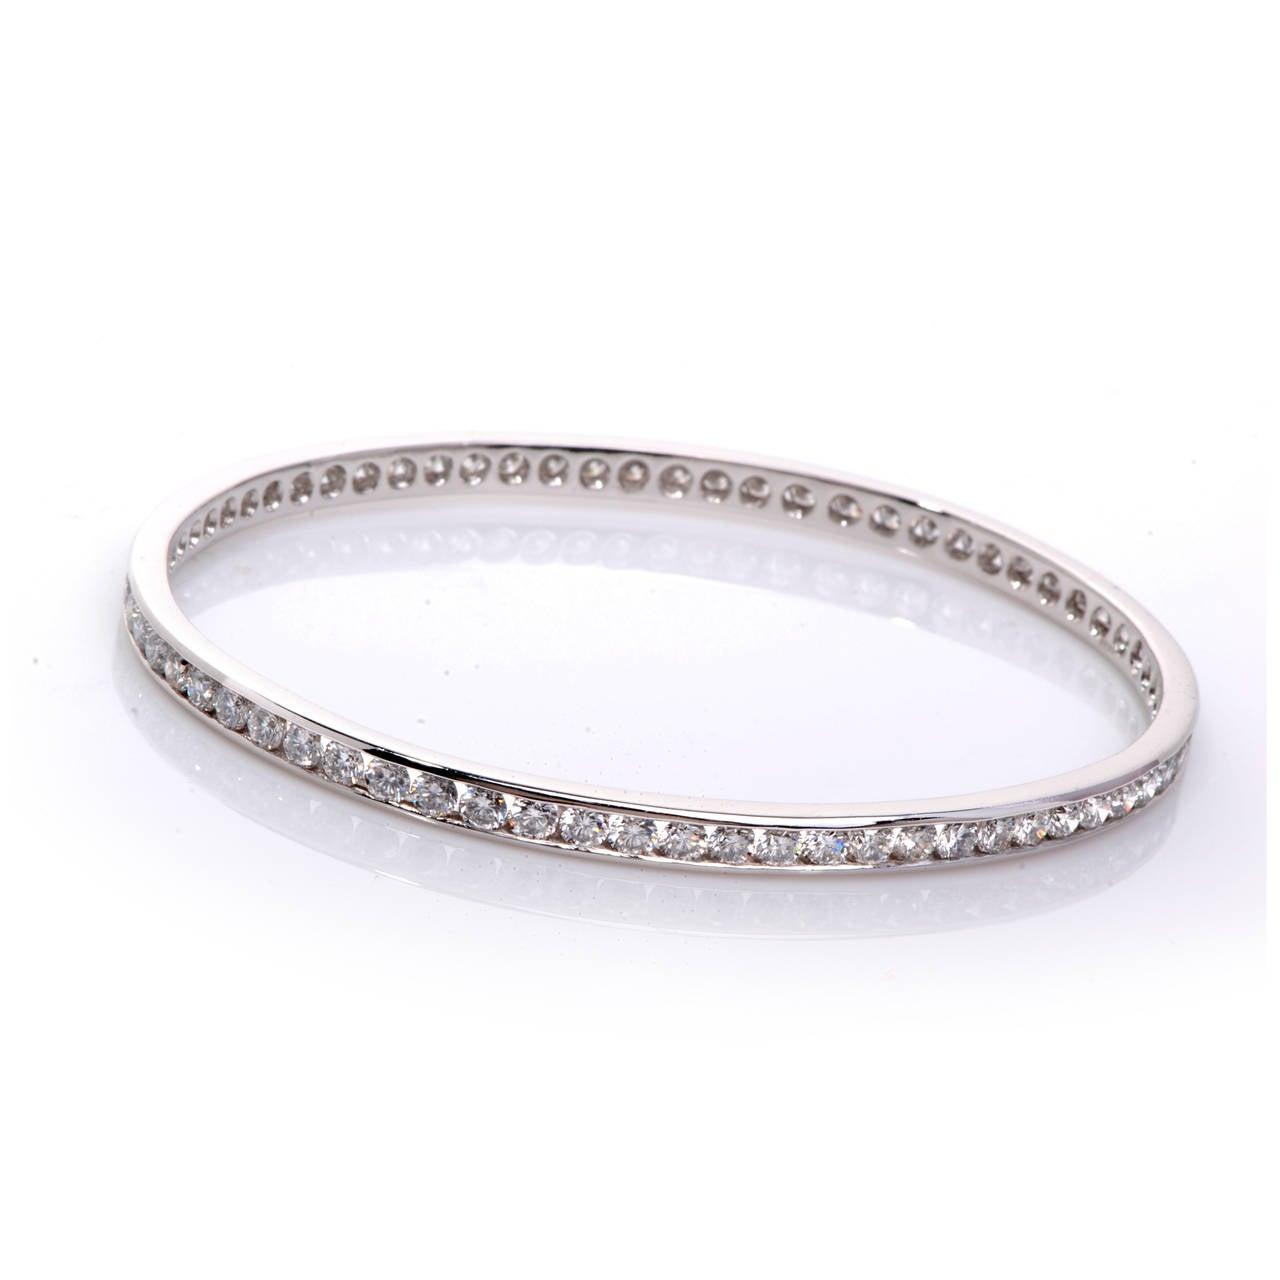 diamond platinum bangle bracelet at 1stdibs